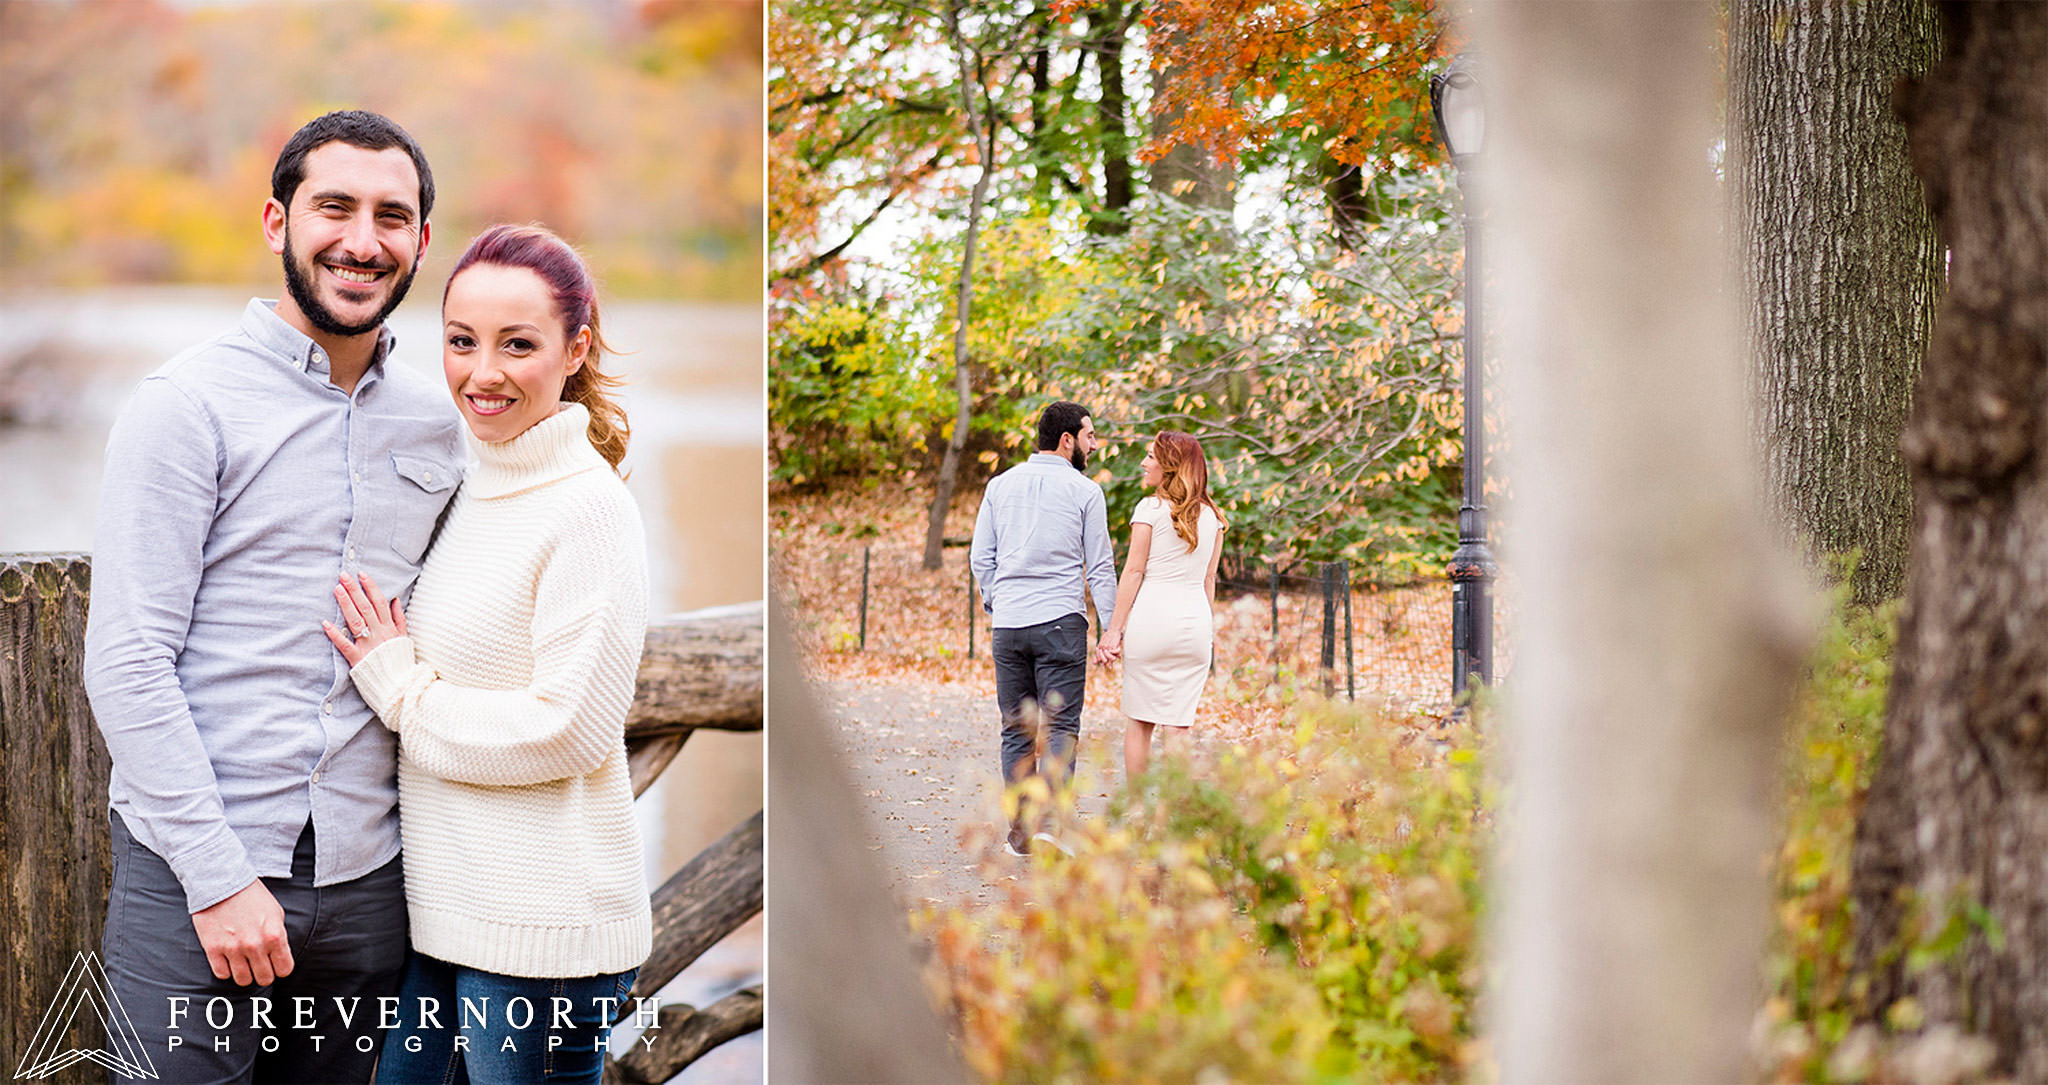 Giangrande-Central-Park-New-York-Engagement-Photos-02.JPG